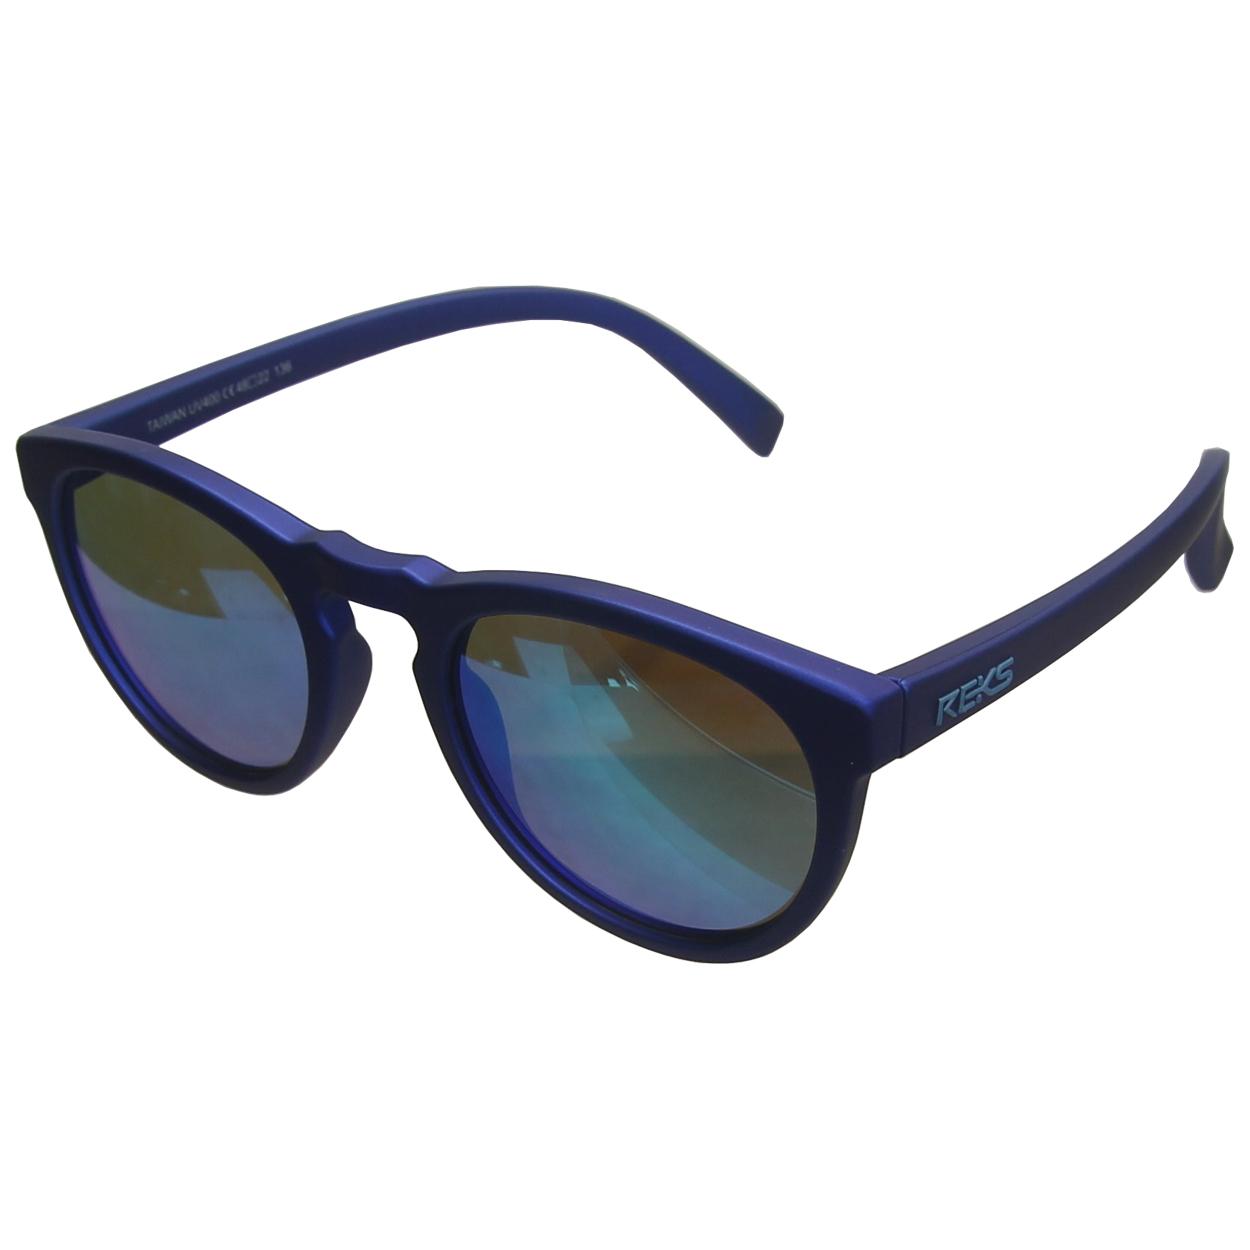 ba8bd74ac3 Reks Optics Round Polarized Sunglasses - GolfEtail.com